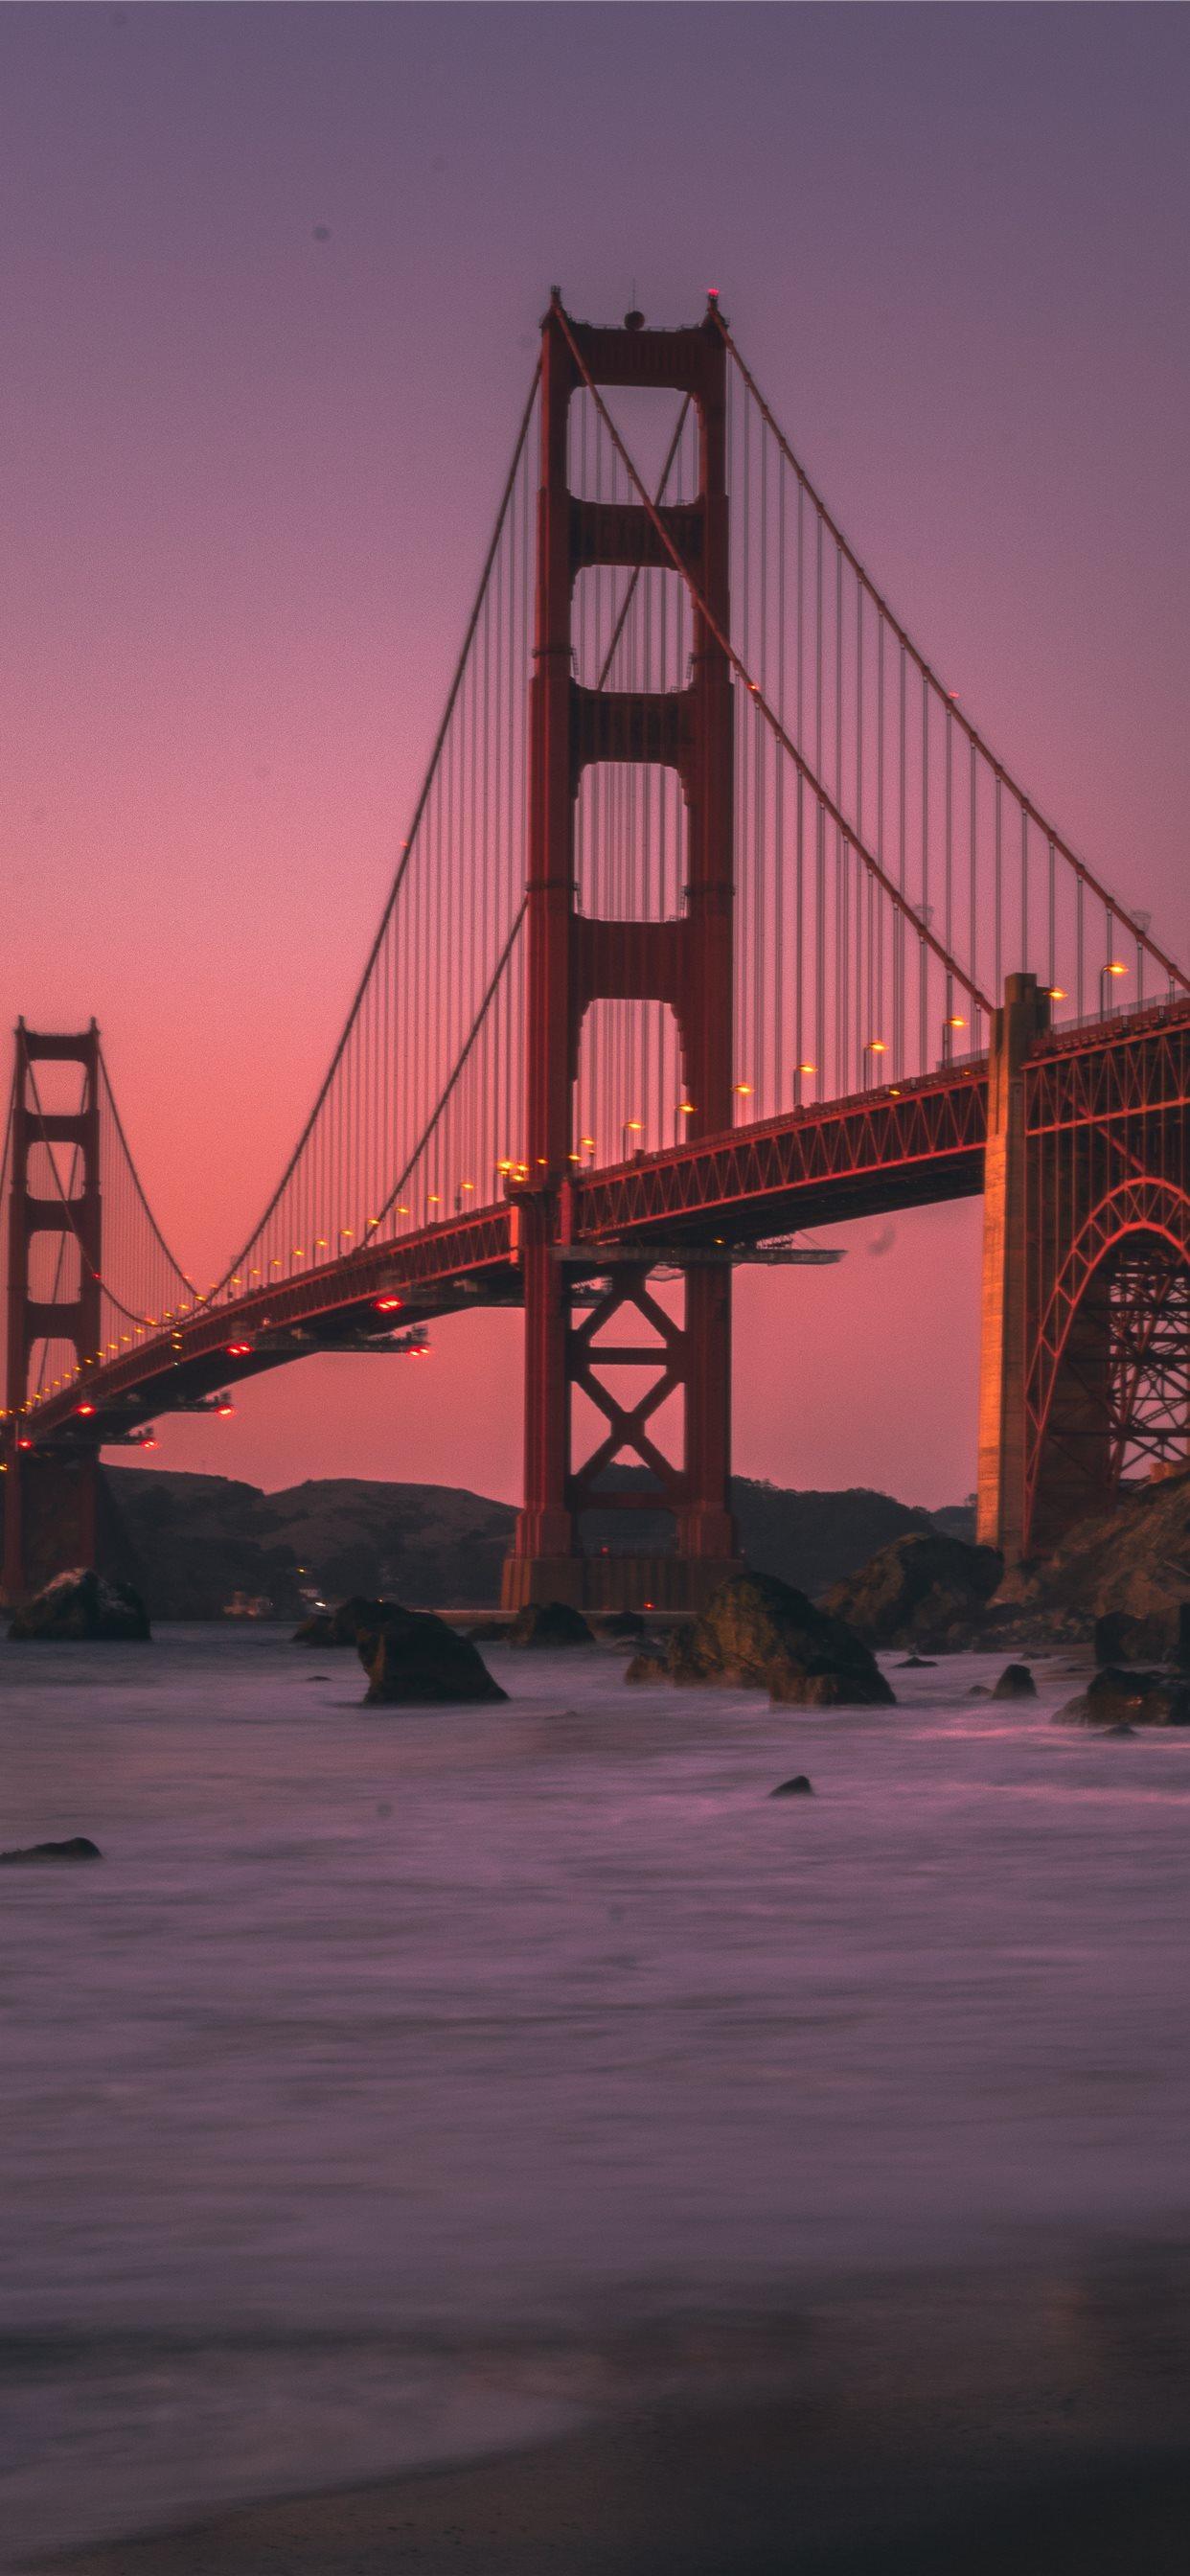 Golden Gate Bridge During Sunset Iphone Wallpapers Free Download